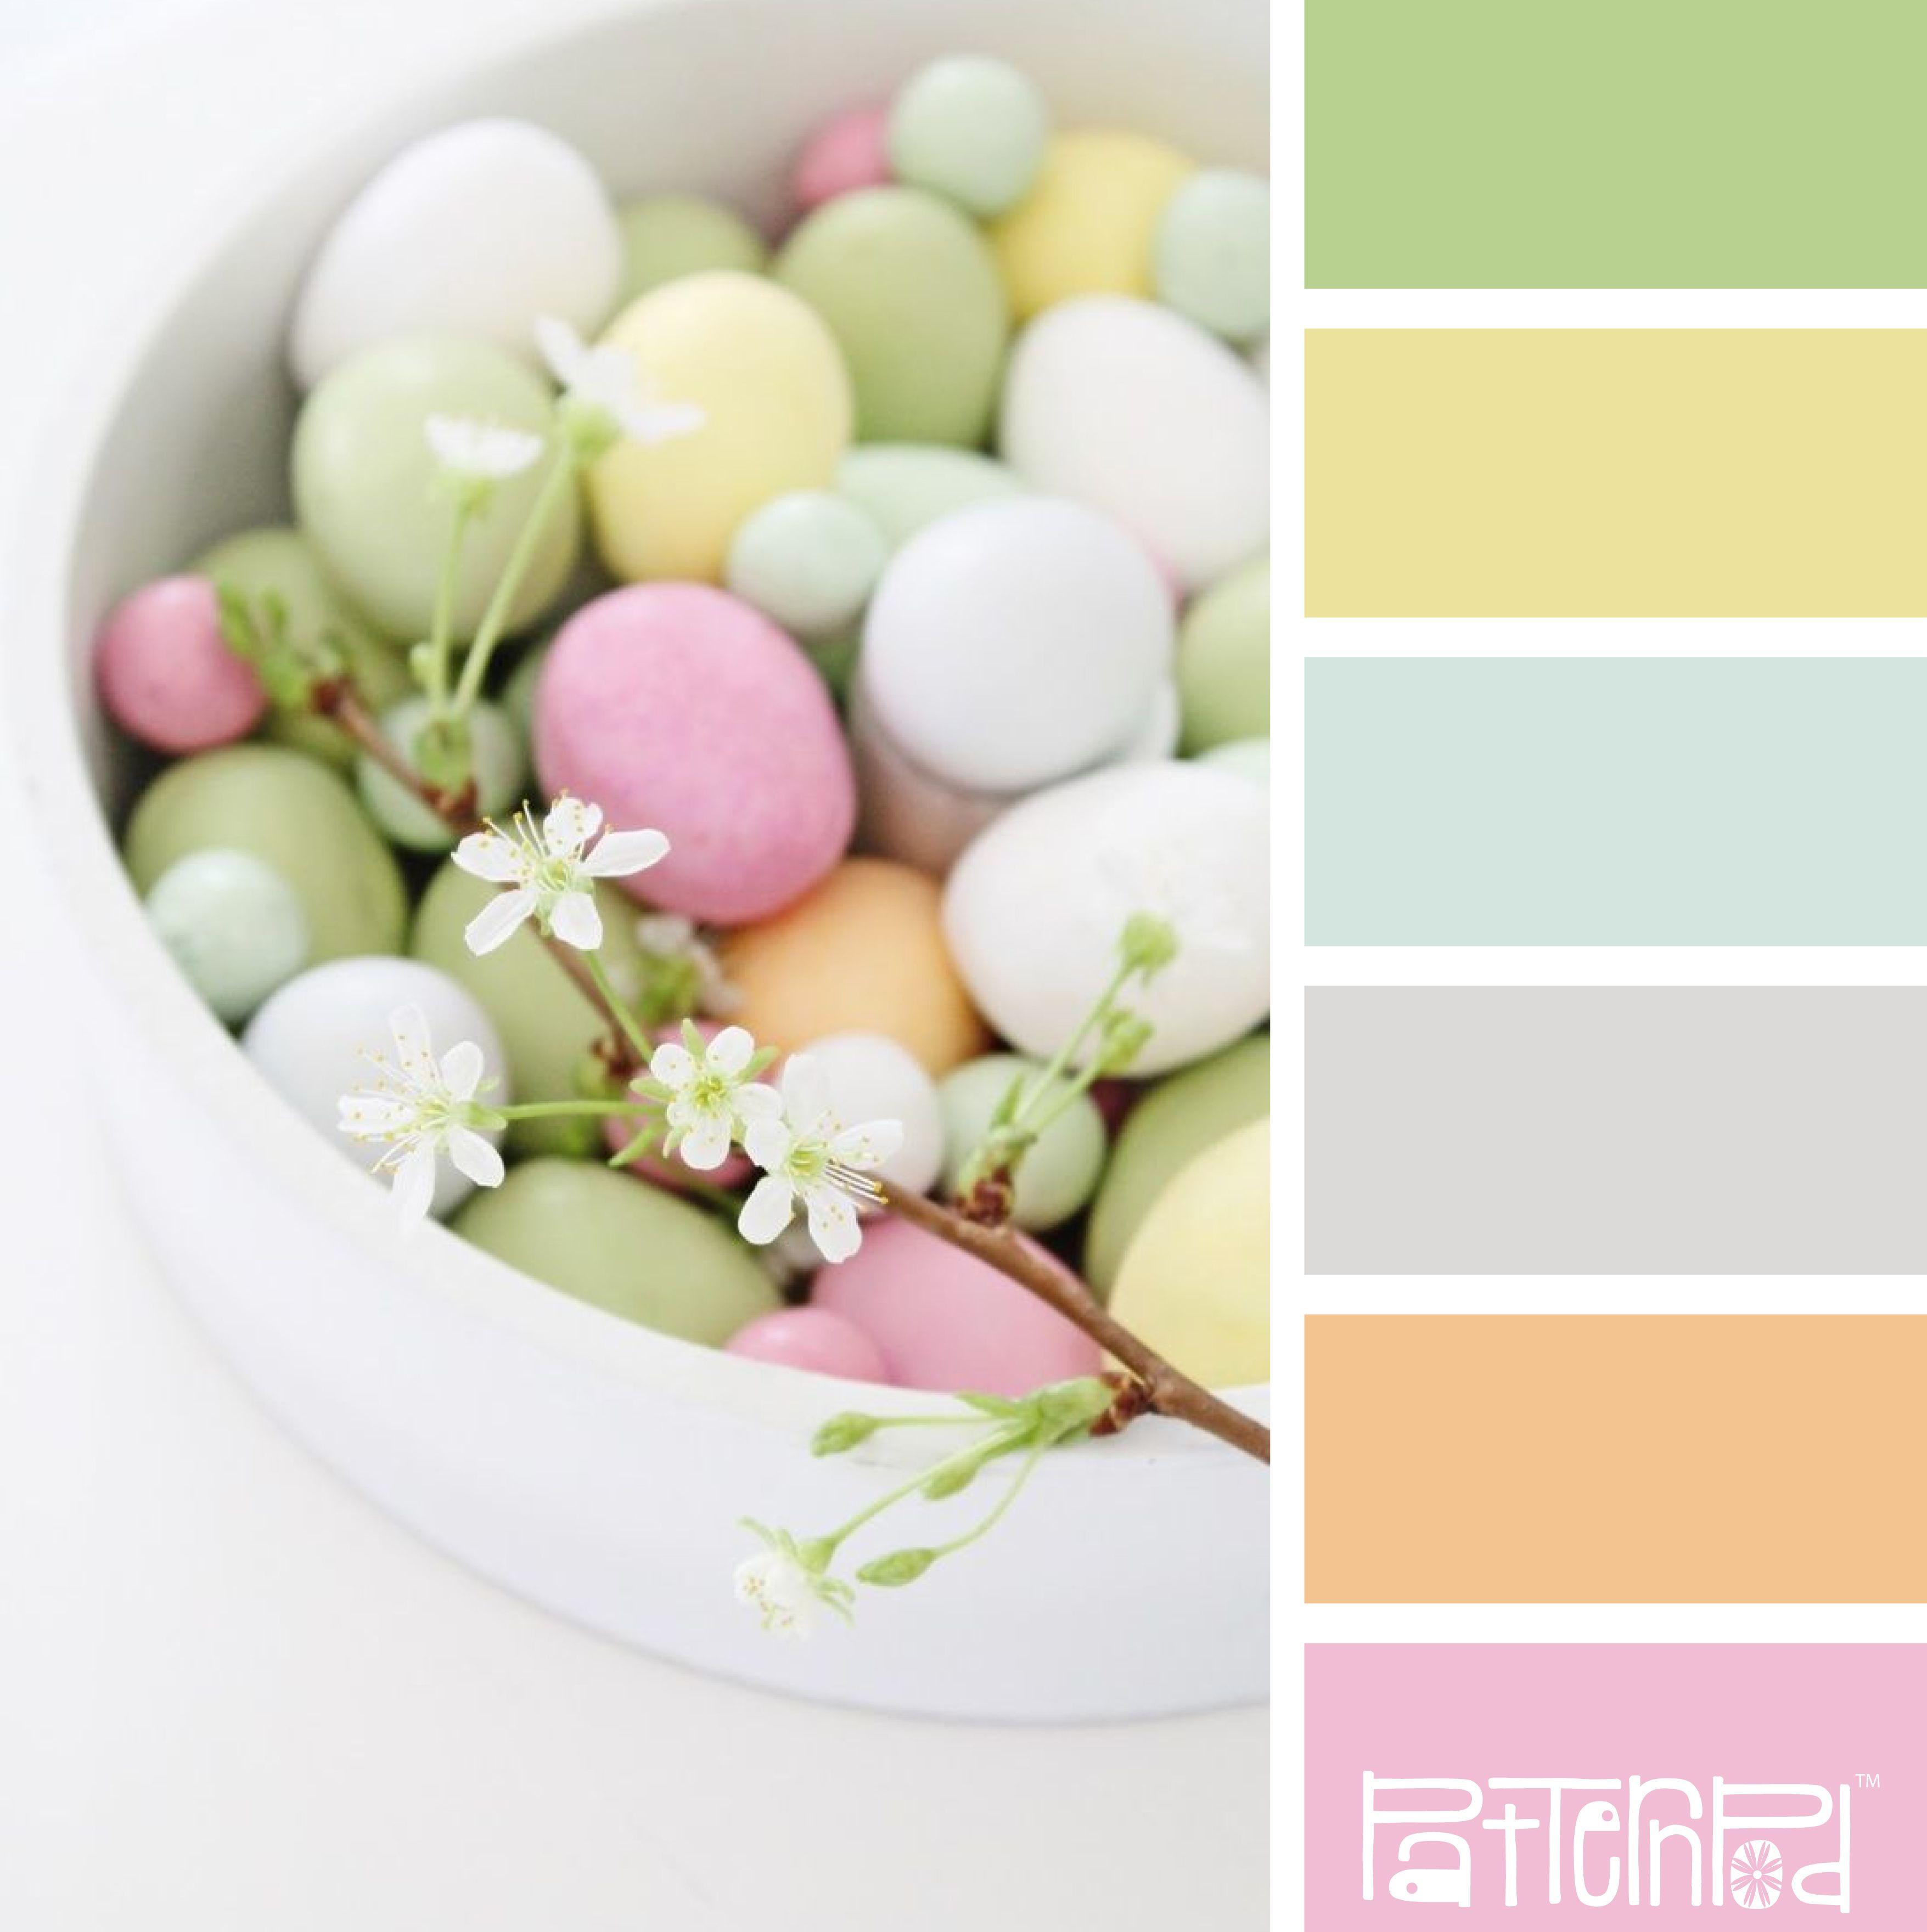 Website soft colors - Easter Pastel Color Palette For A Colorful Website